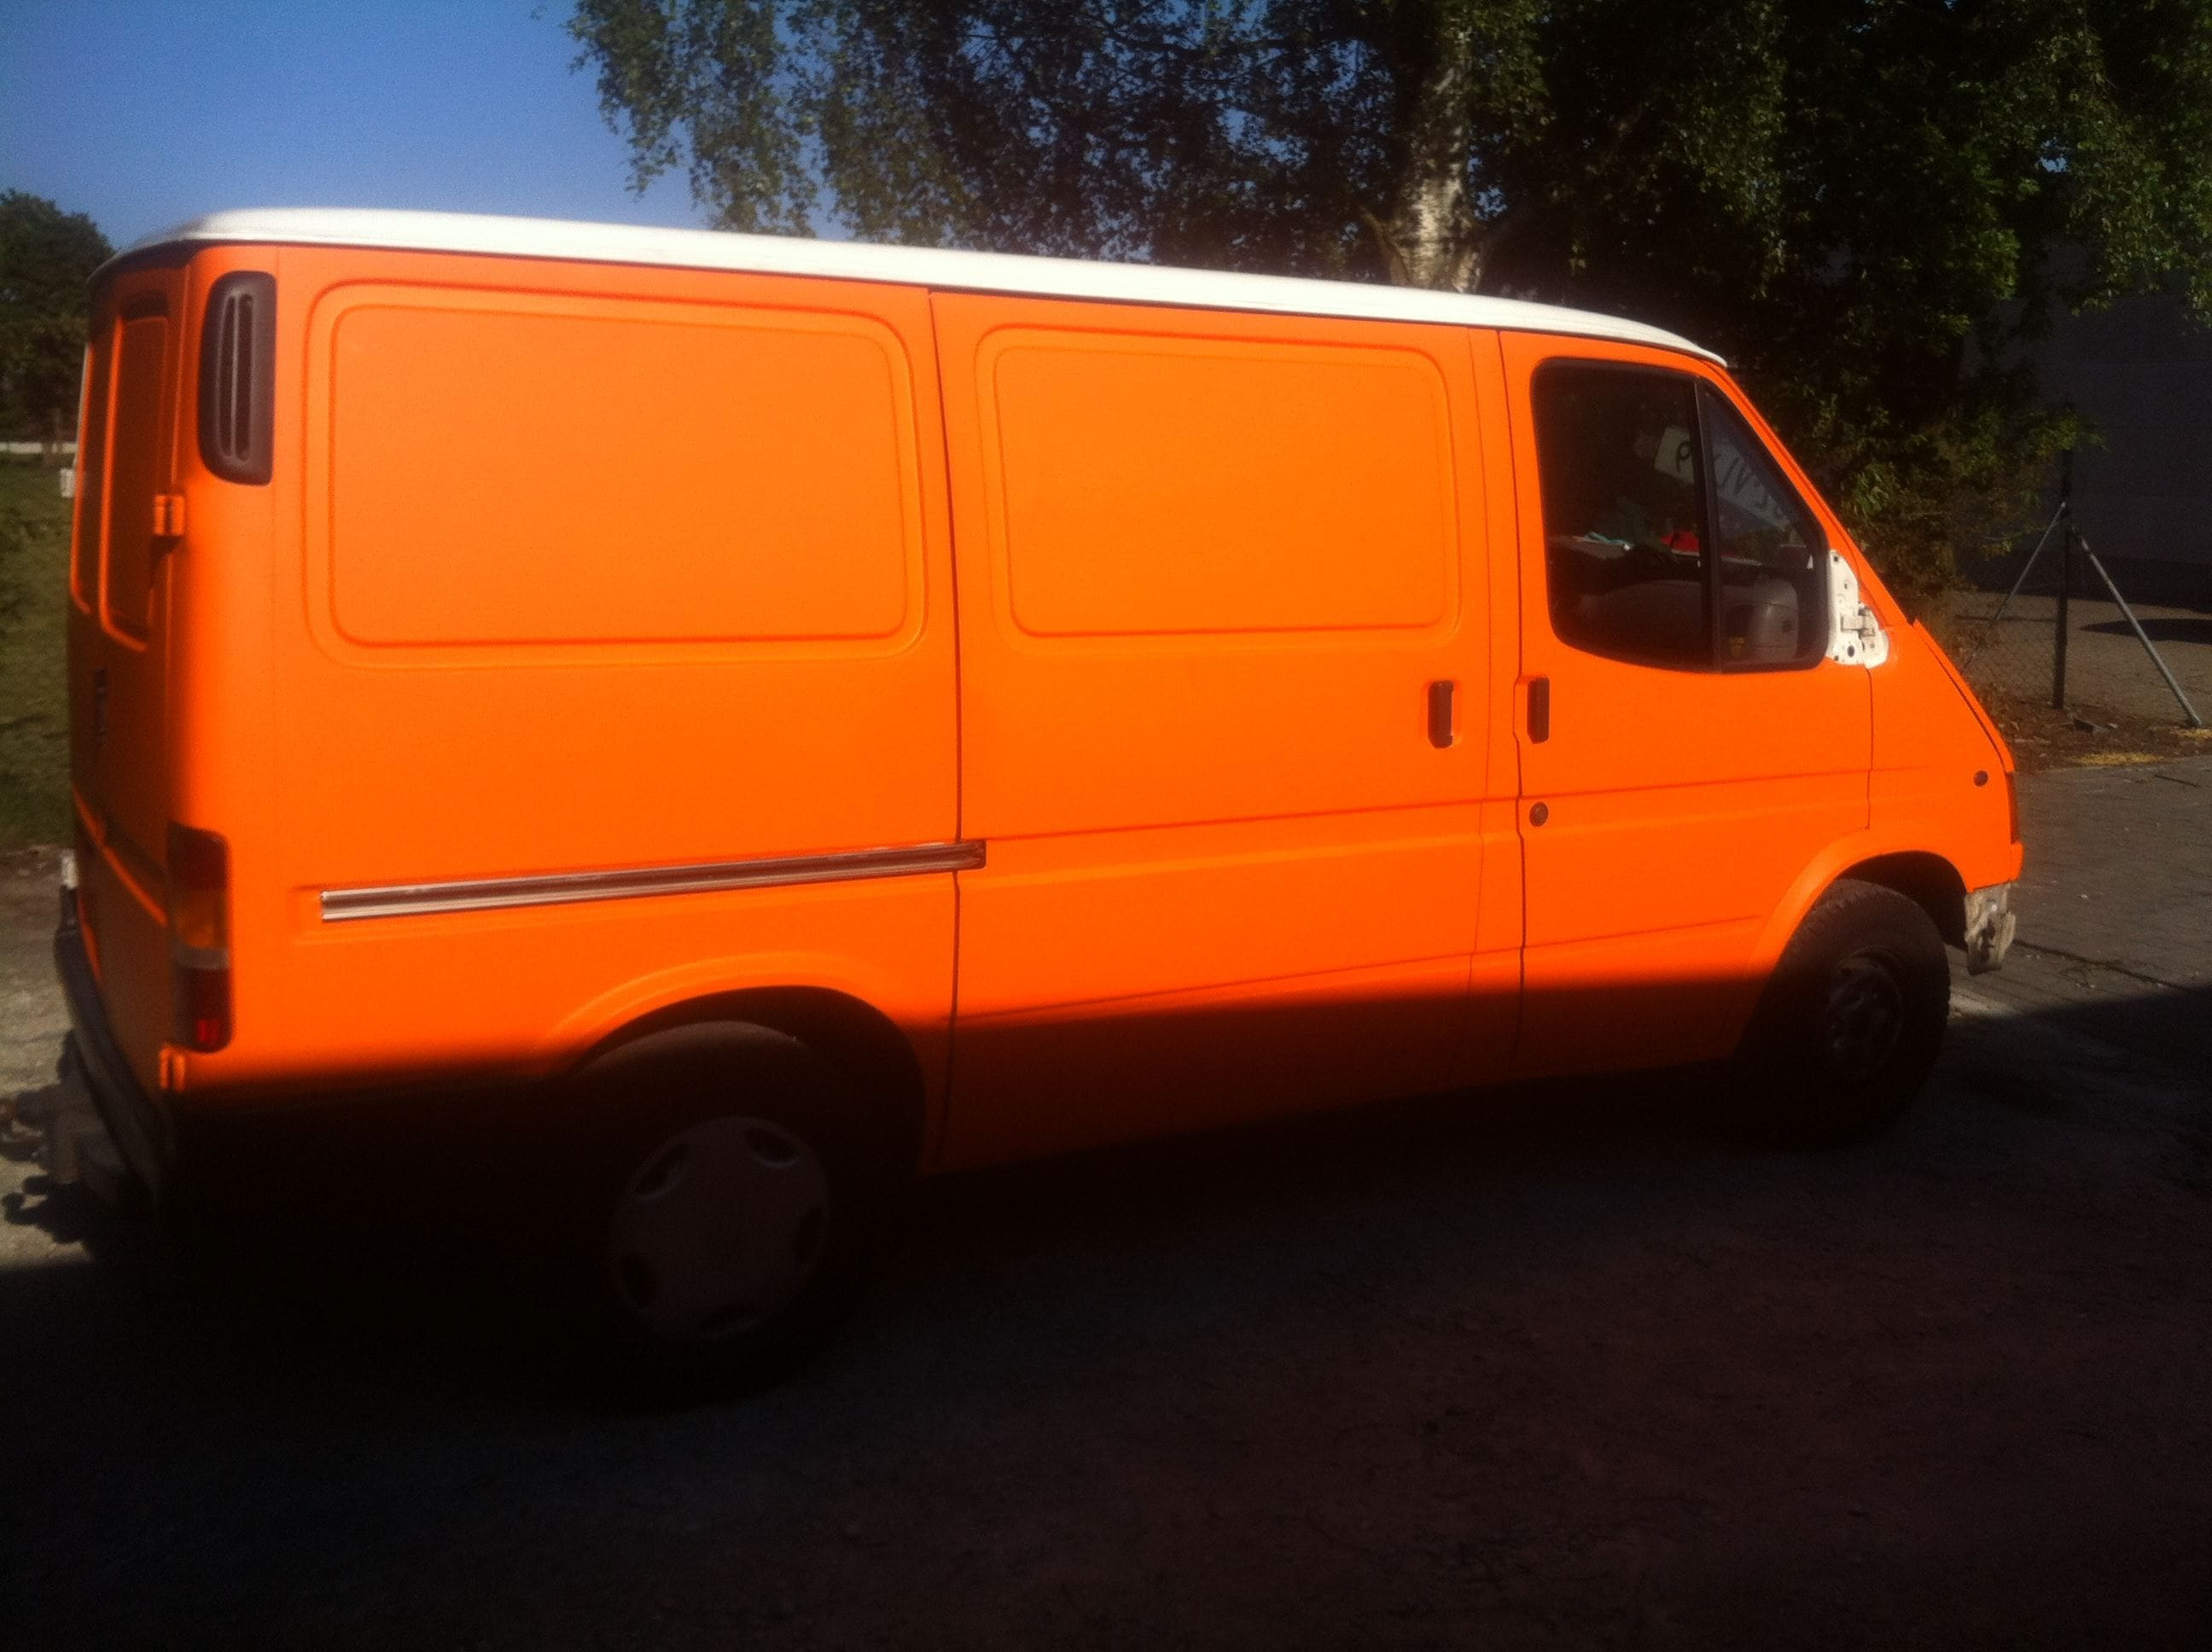 Ford Transit met Mat Oranje Wrap, Carwrapping door Wrapmyride.nu Foto-nr:5844, ©2021